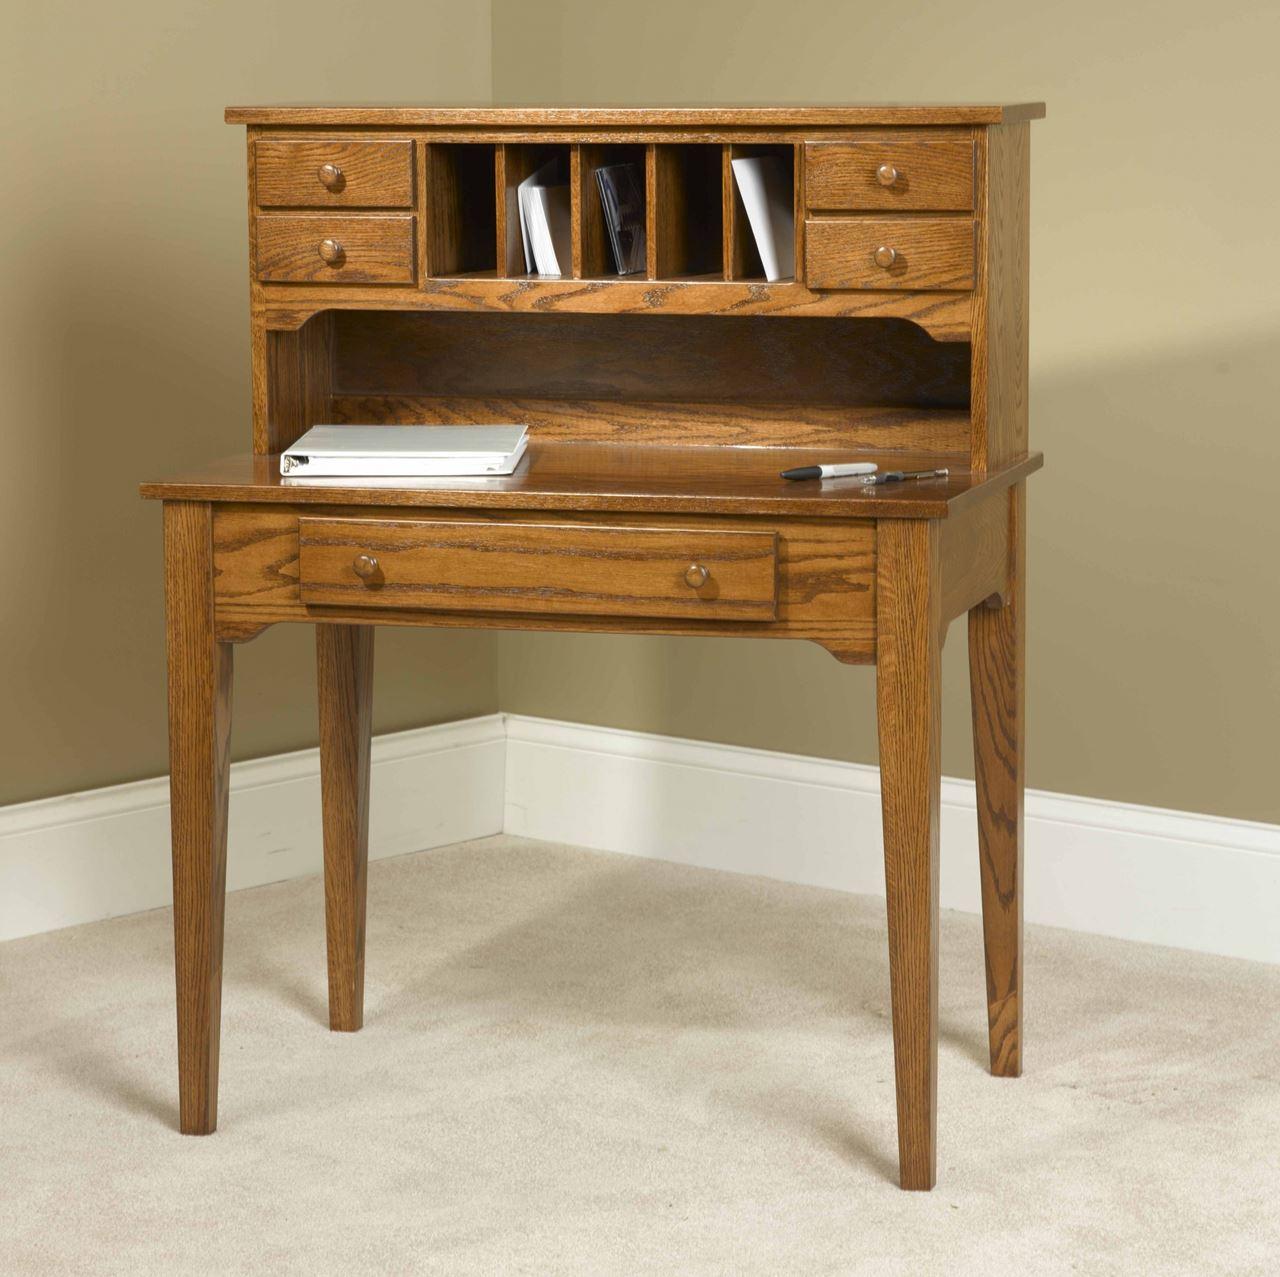 Four Seasons Furnishings-Amish Made Furniture . Solid Wood